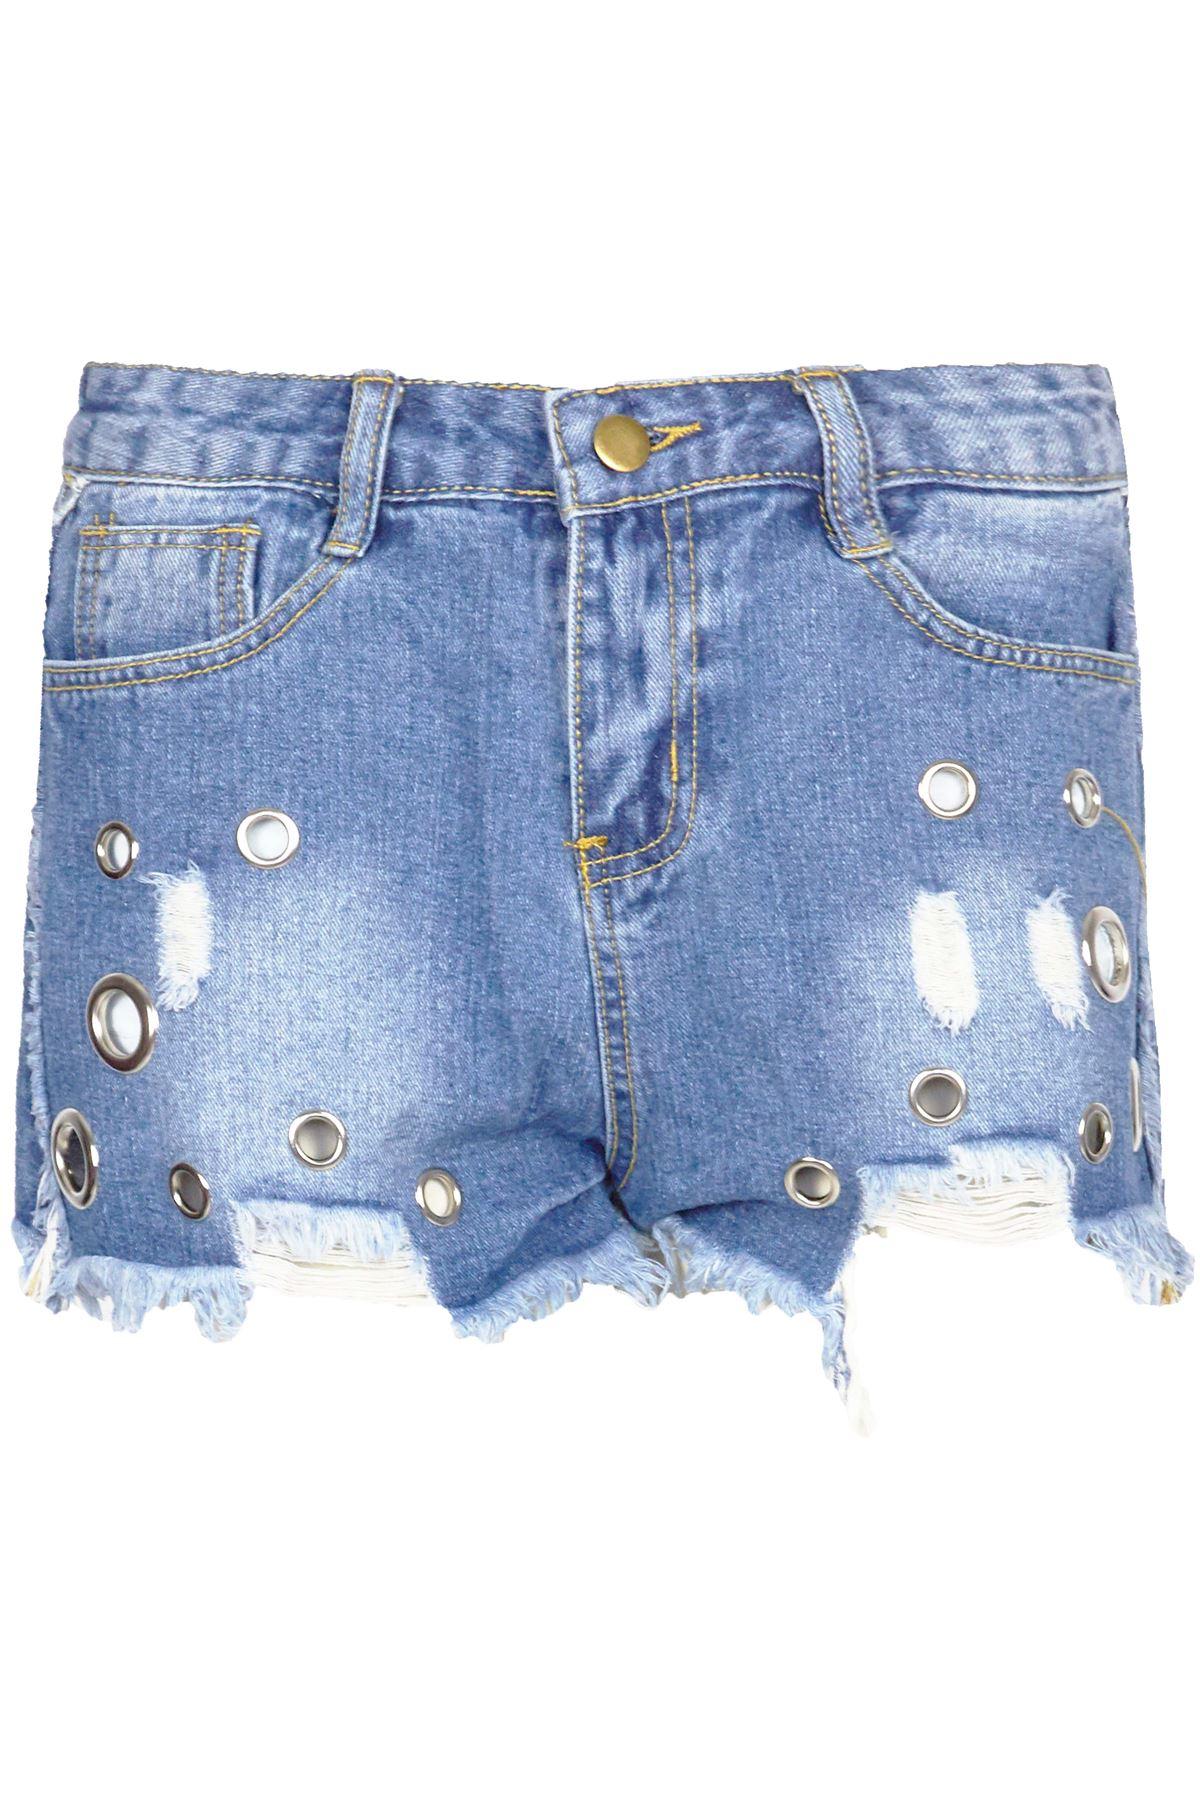 damen frauen verblichen jeans zerrissen roh kanten l cher sen denim kurze hose ebay. Black Bedroom Furniture Sets. Home Design Ideas